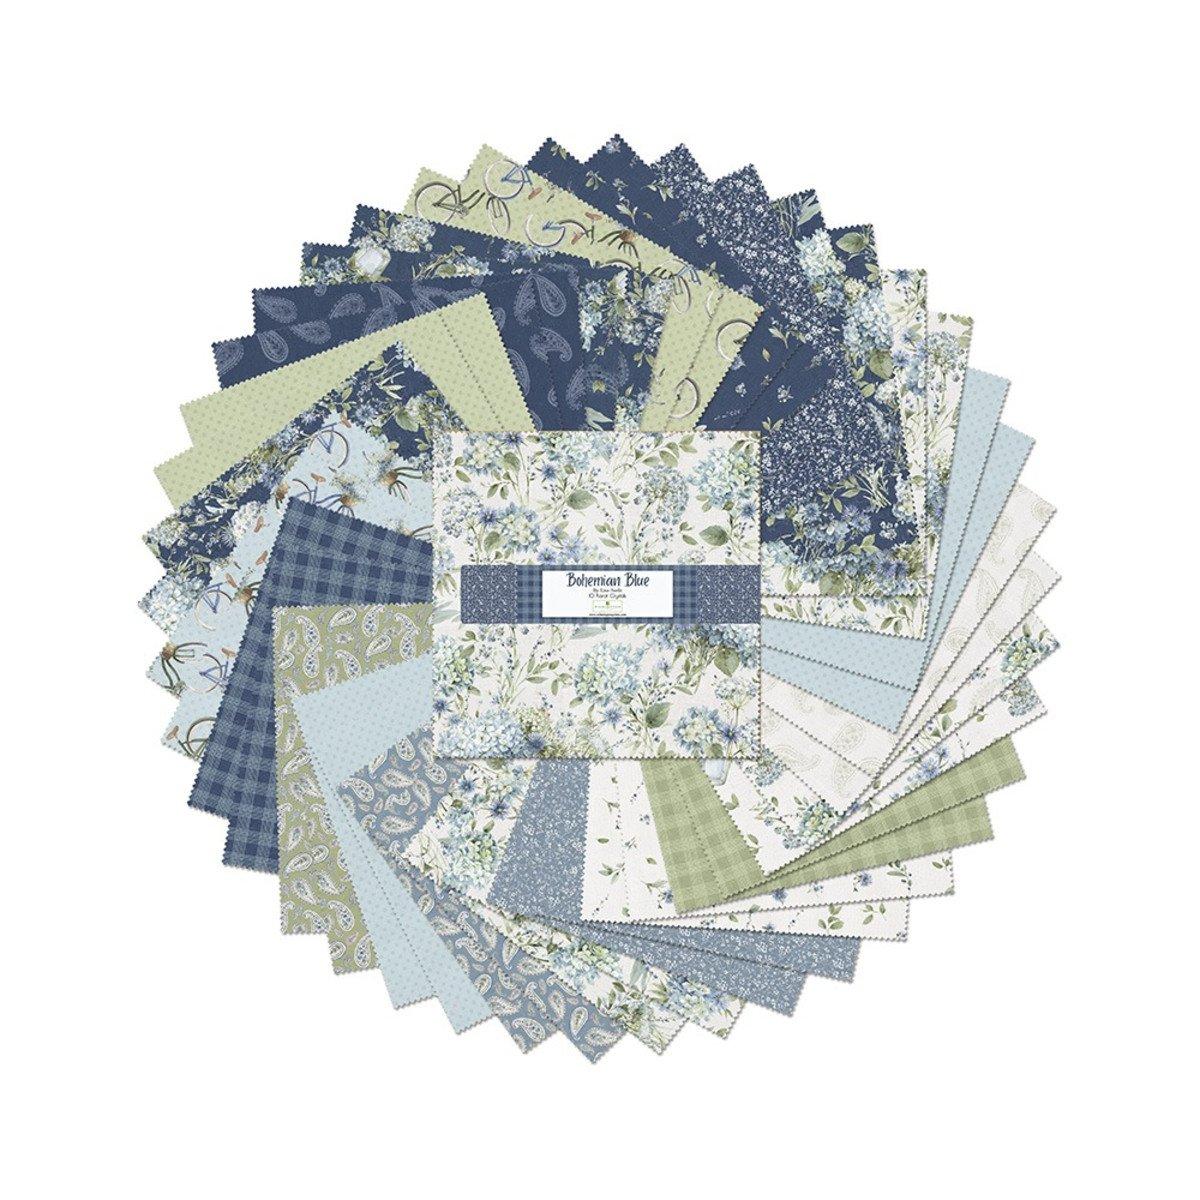 Bohemian Blue 10 Karat Crystals - 42 - 10-inch Squares - Lisa Audit